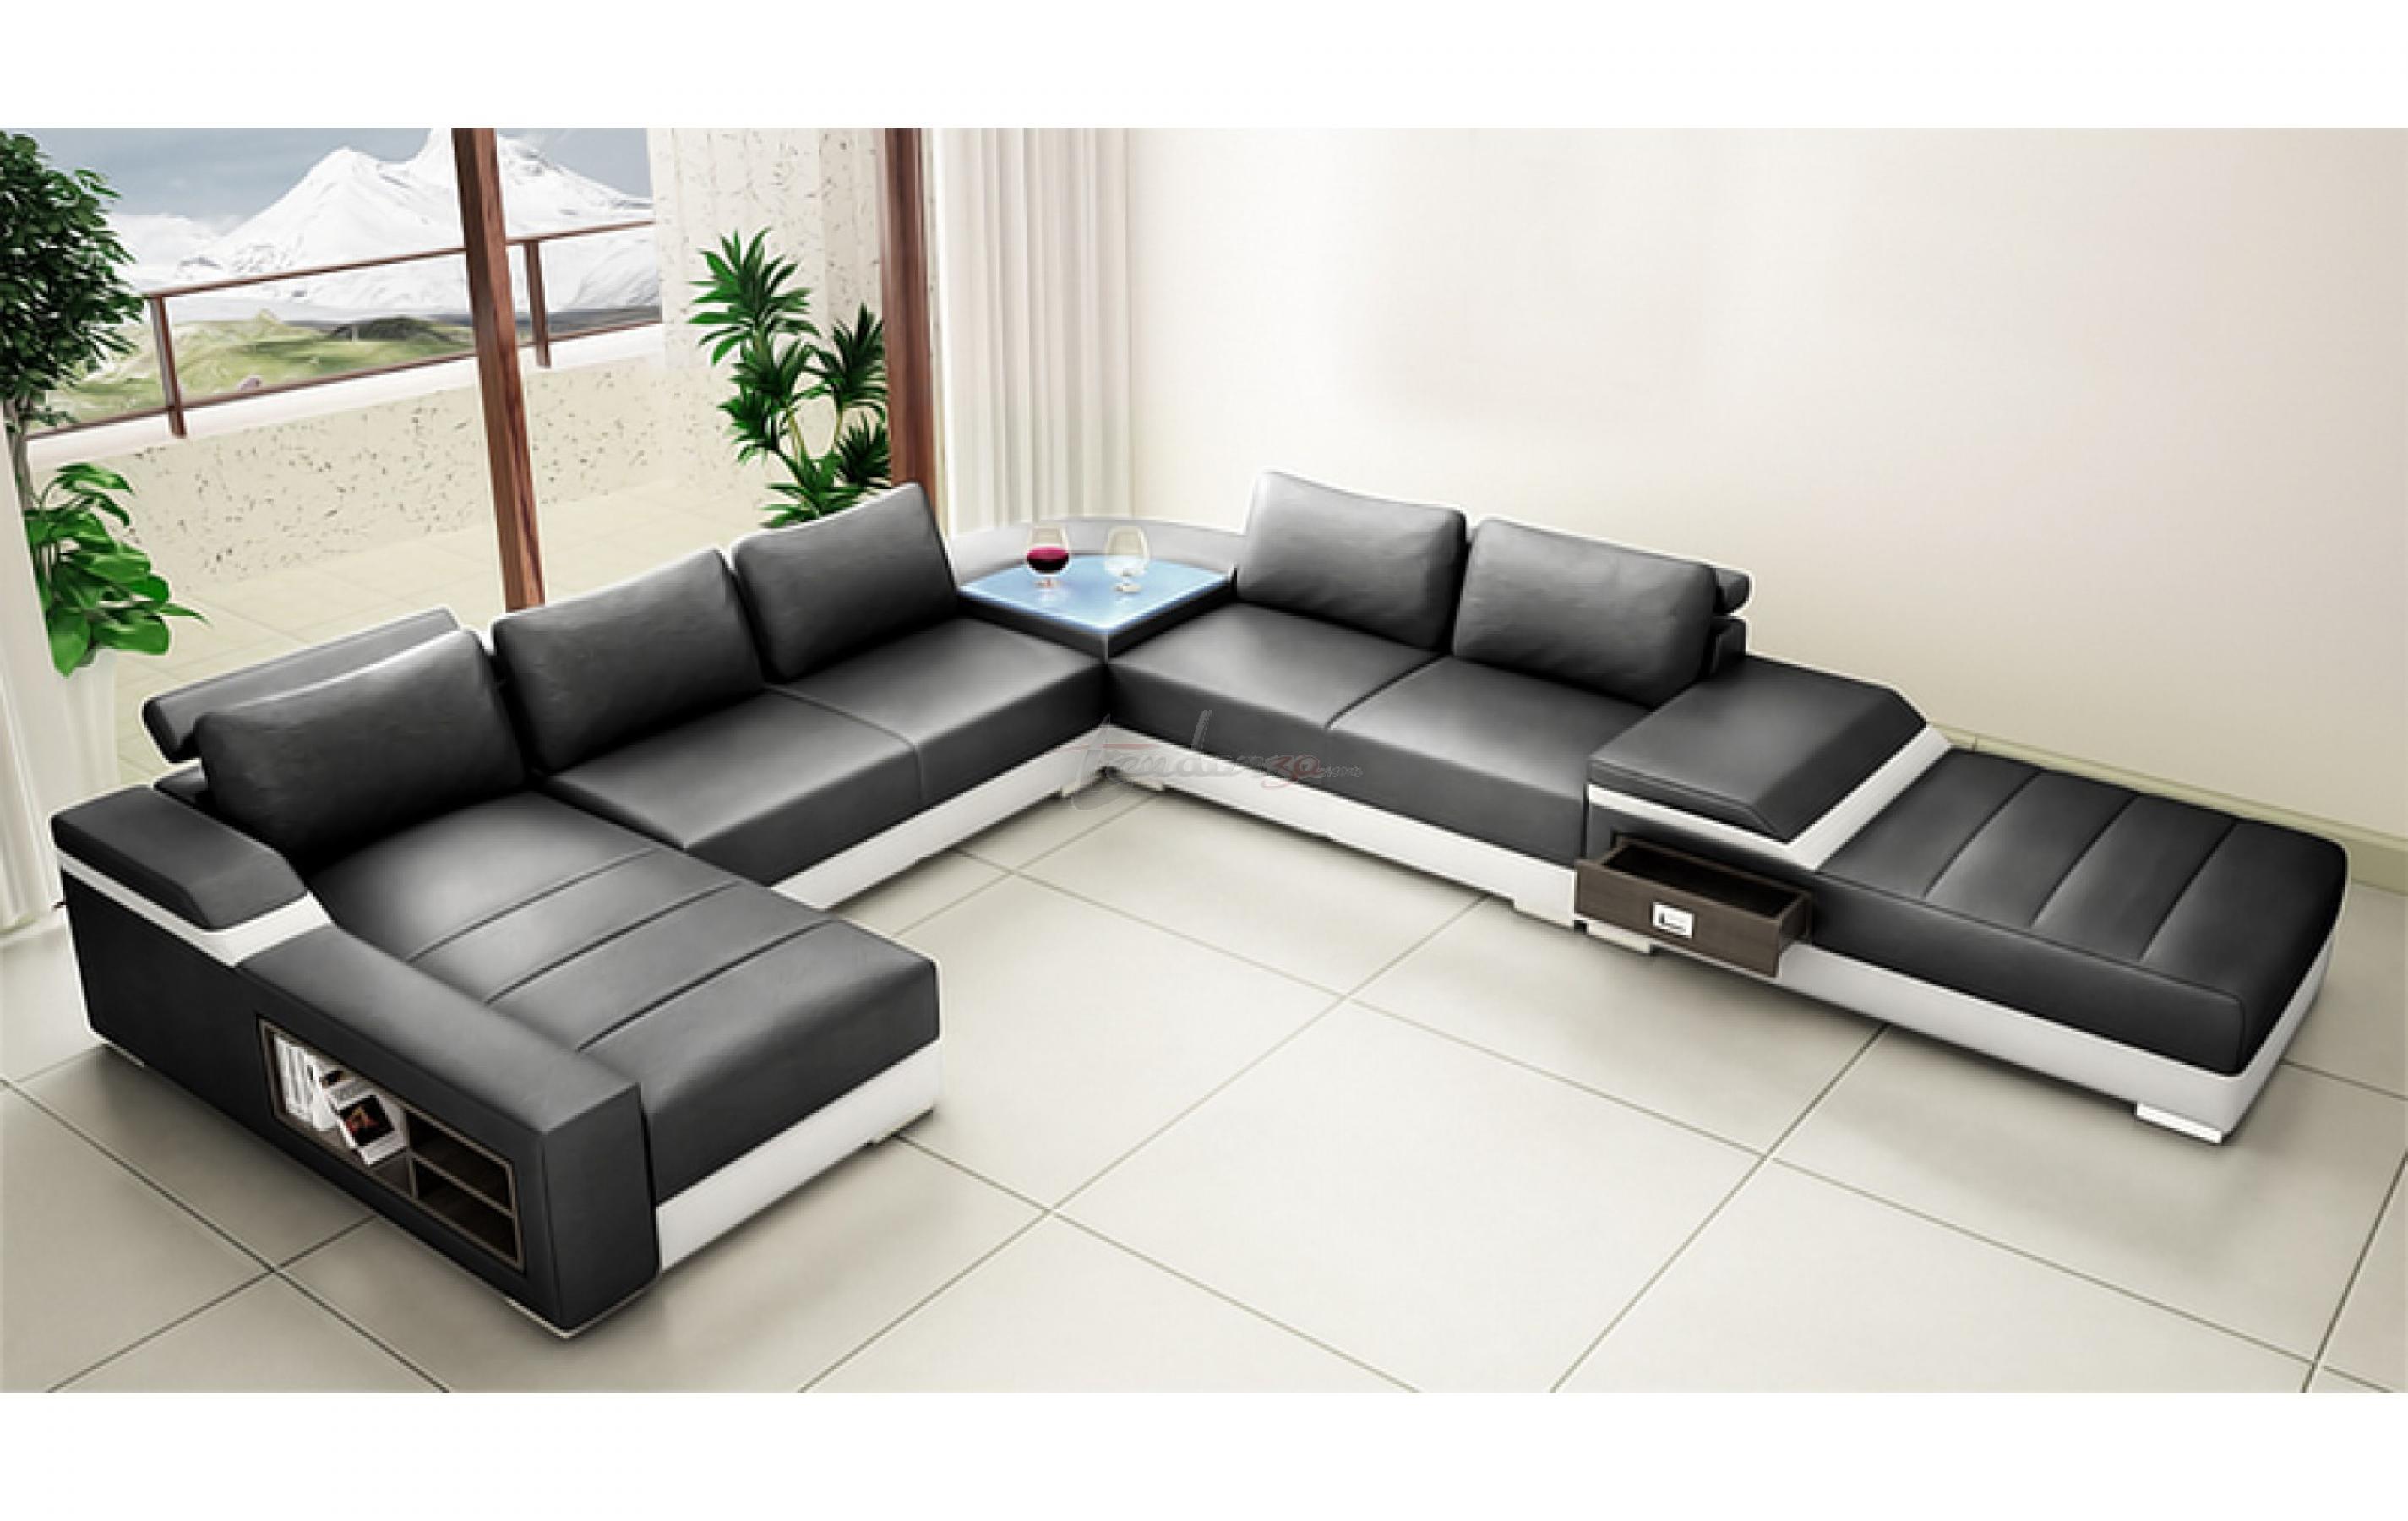 photos canap modulable pas cher. Black Bedroom Furniture Sets. Home Design Ideas